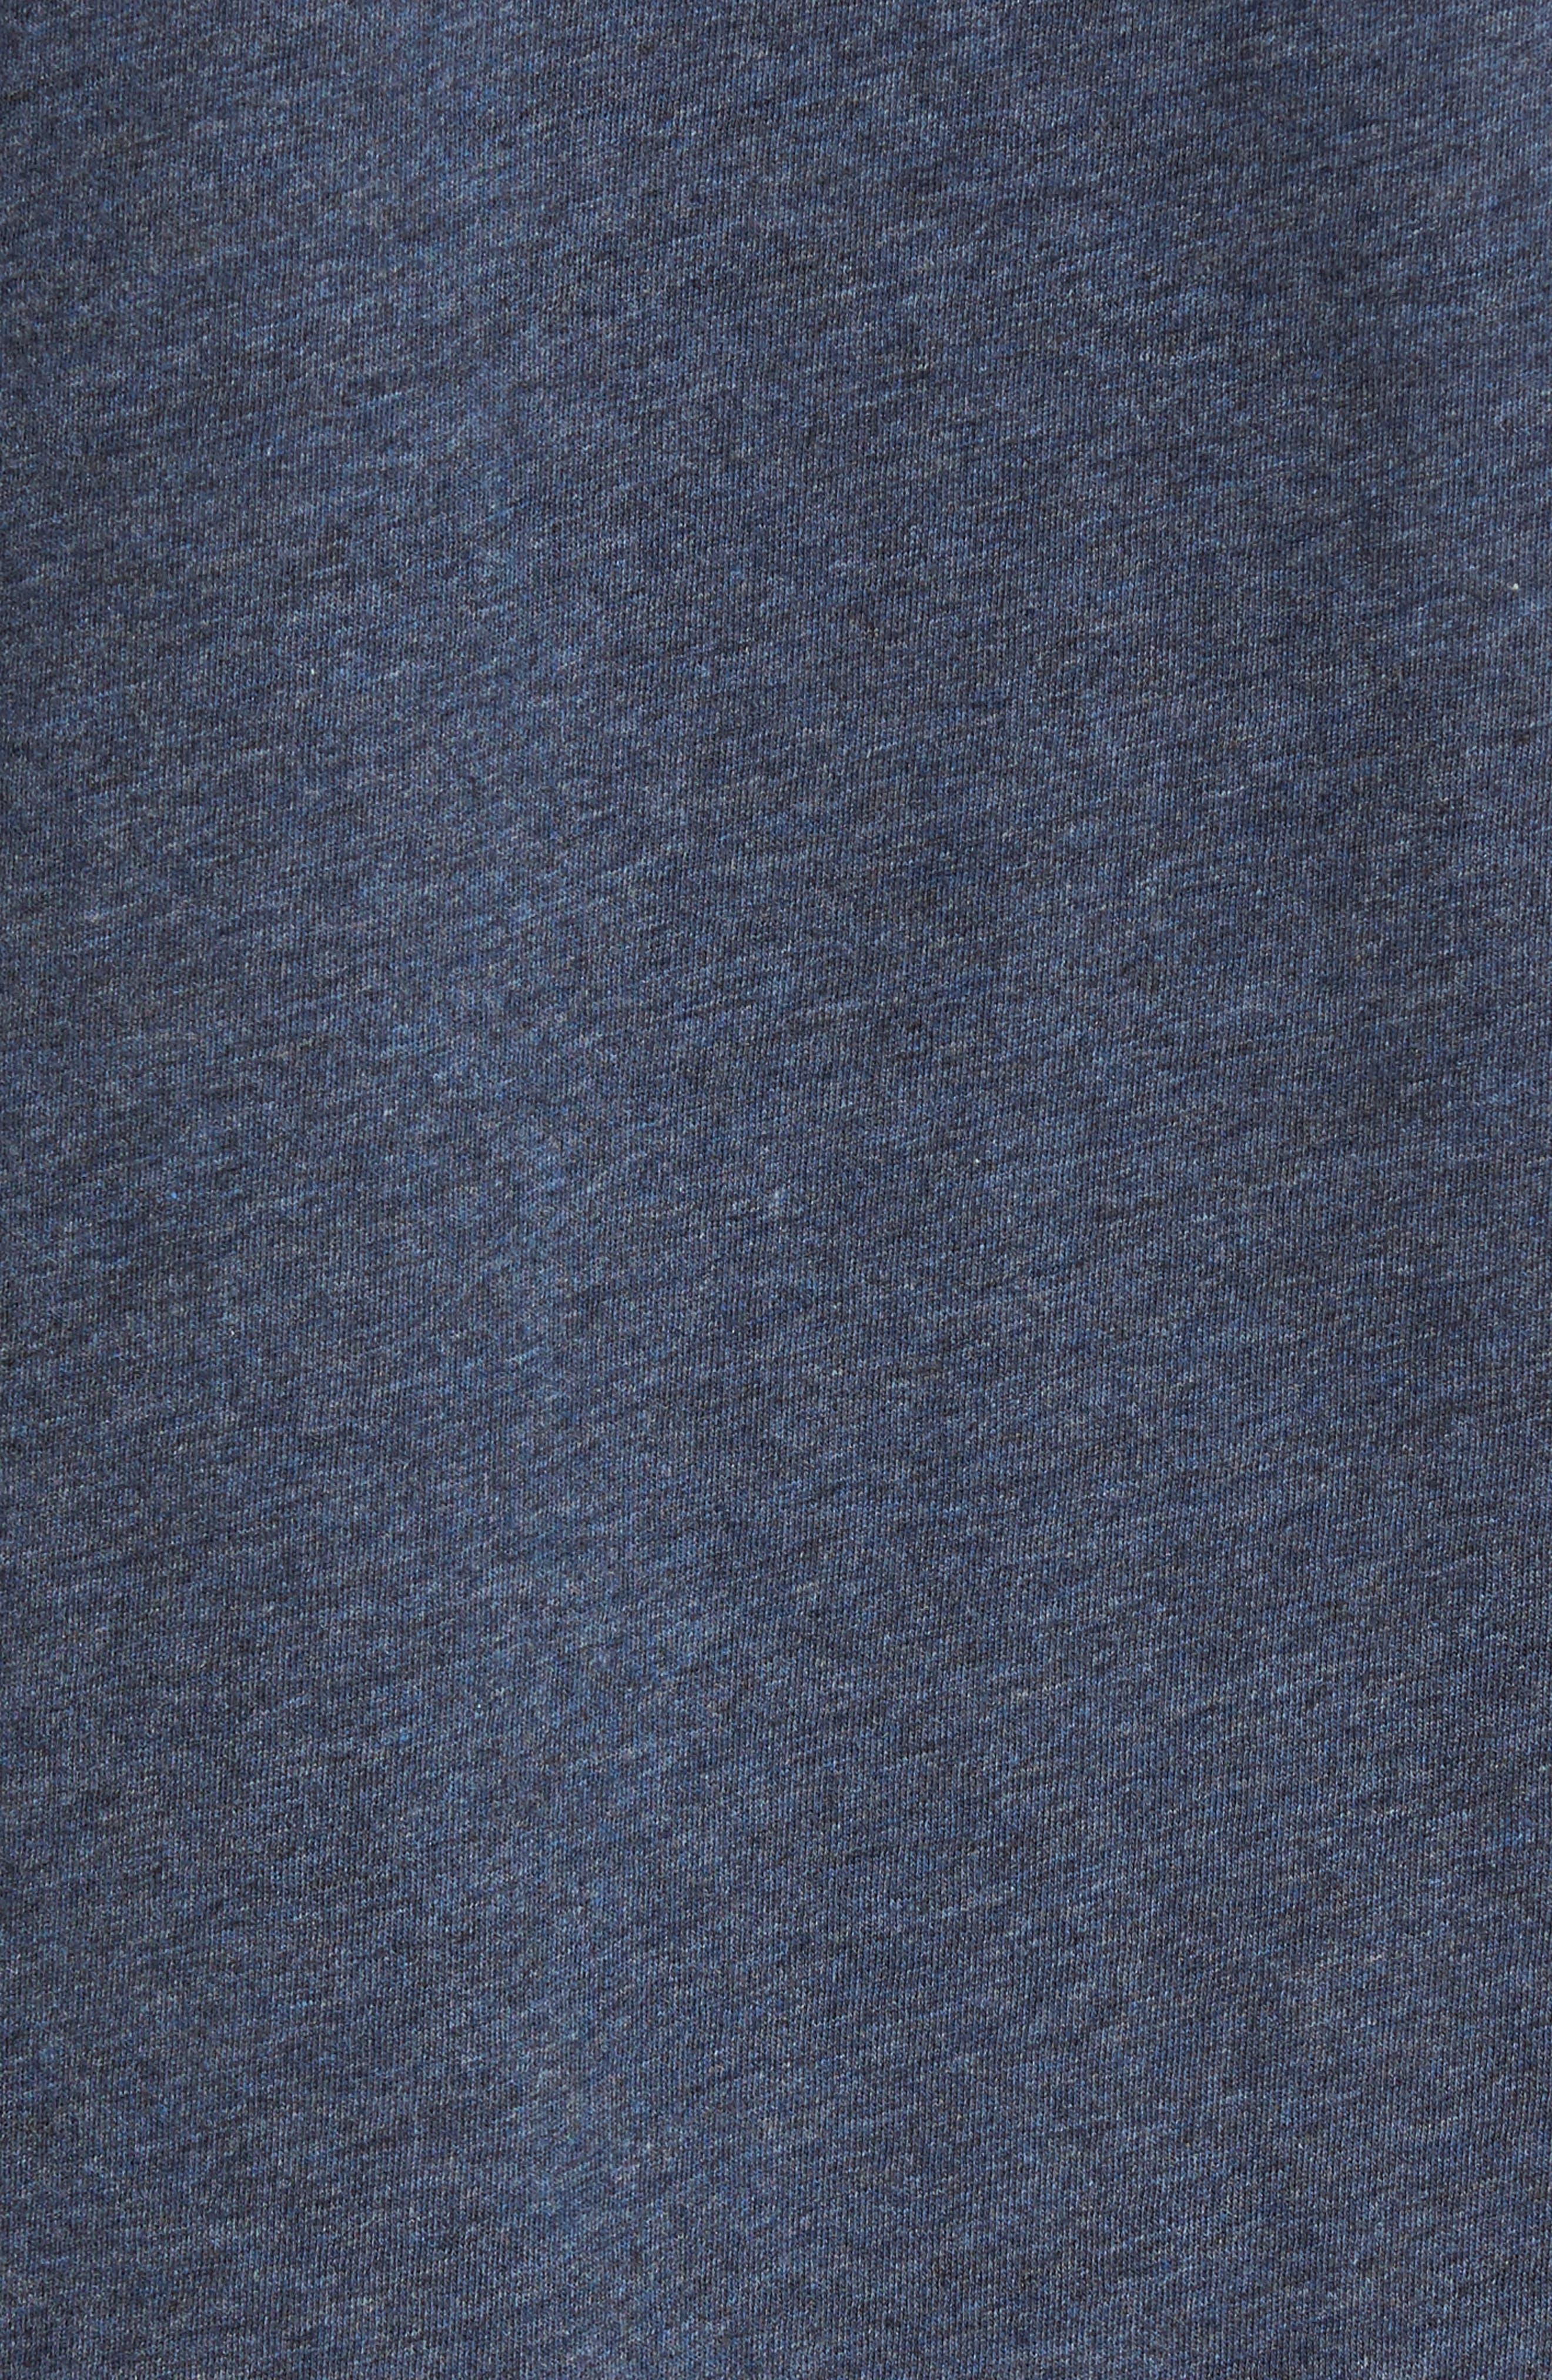 Slim V-Neck T-Shirt,                             Alternate thumbnail 5, color,                             Heather Navy